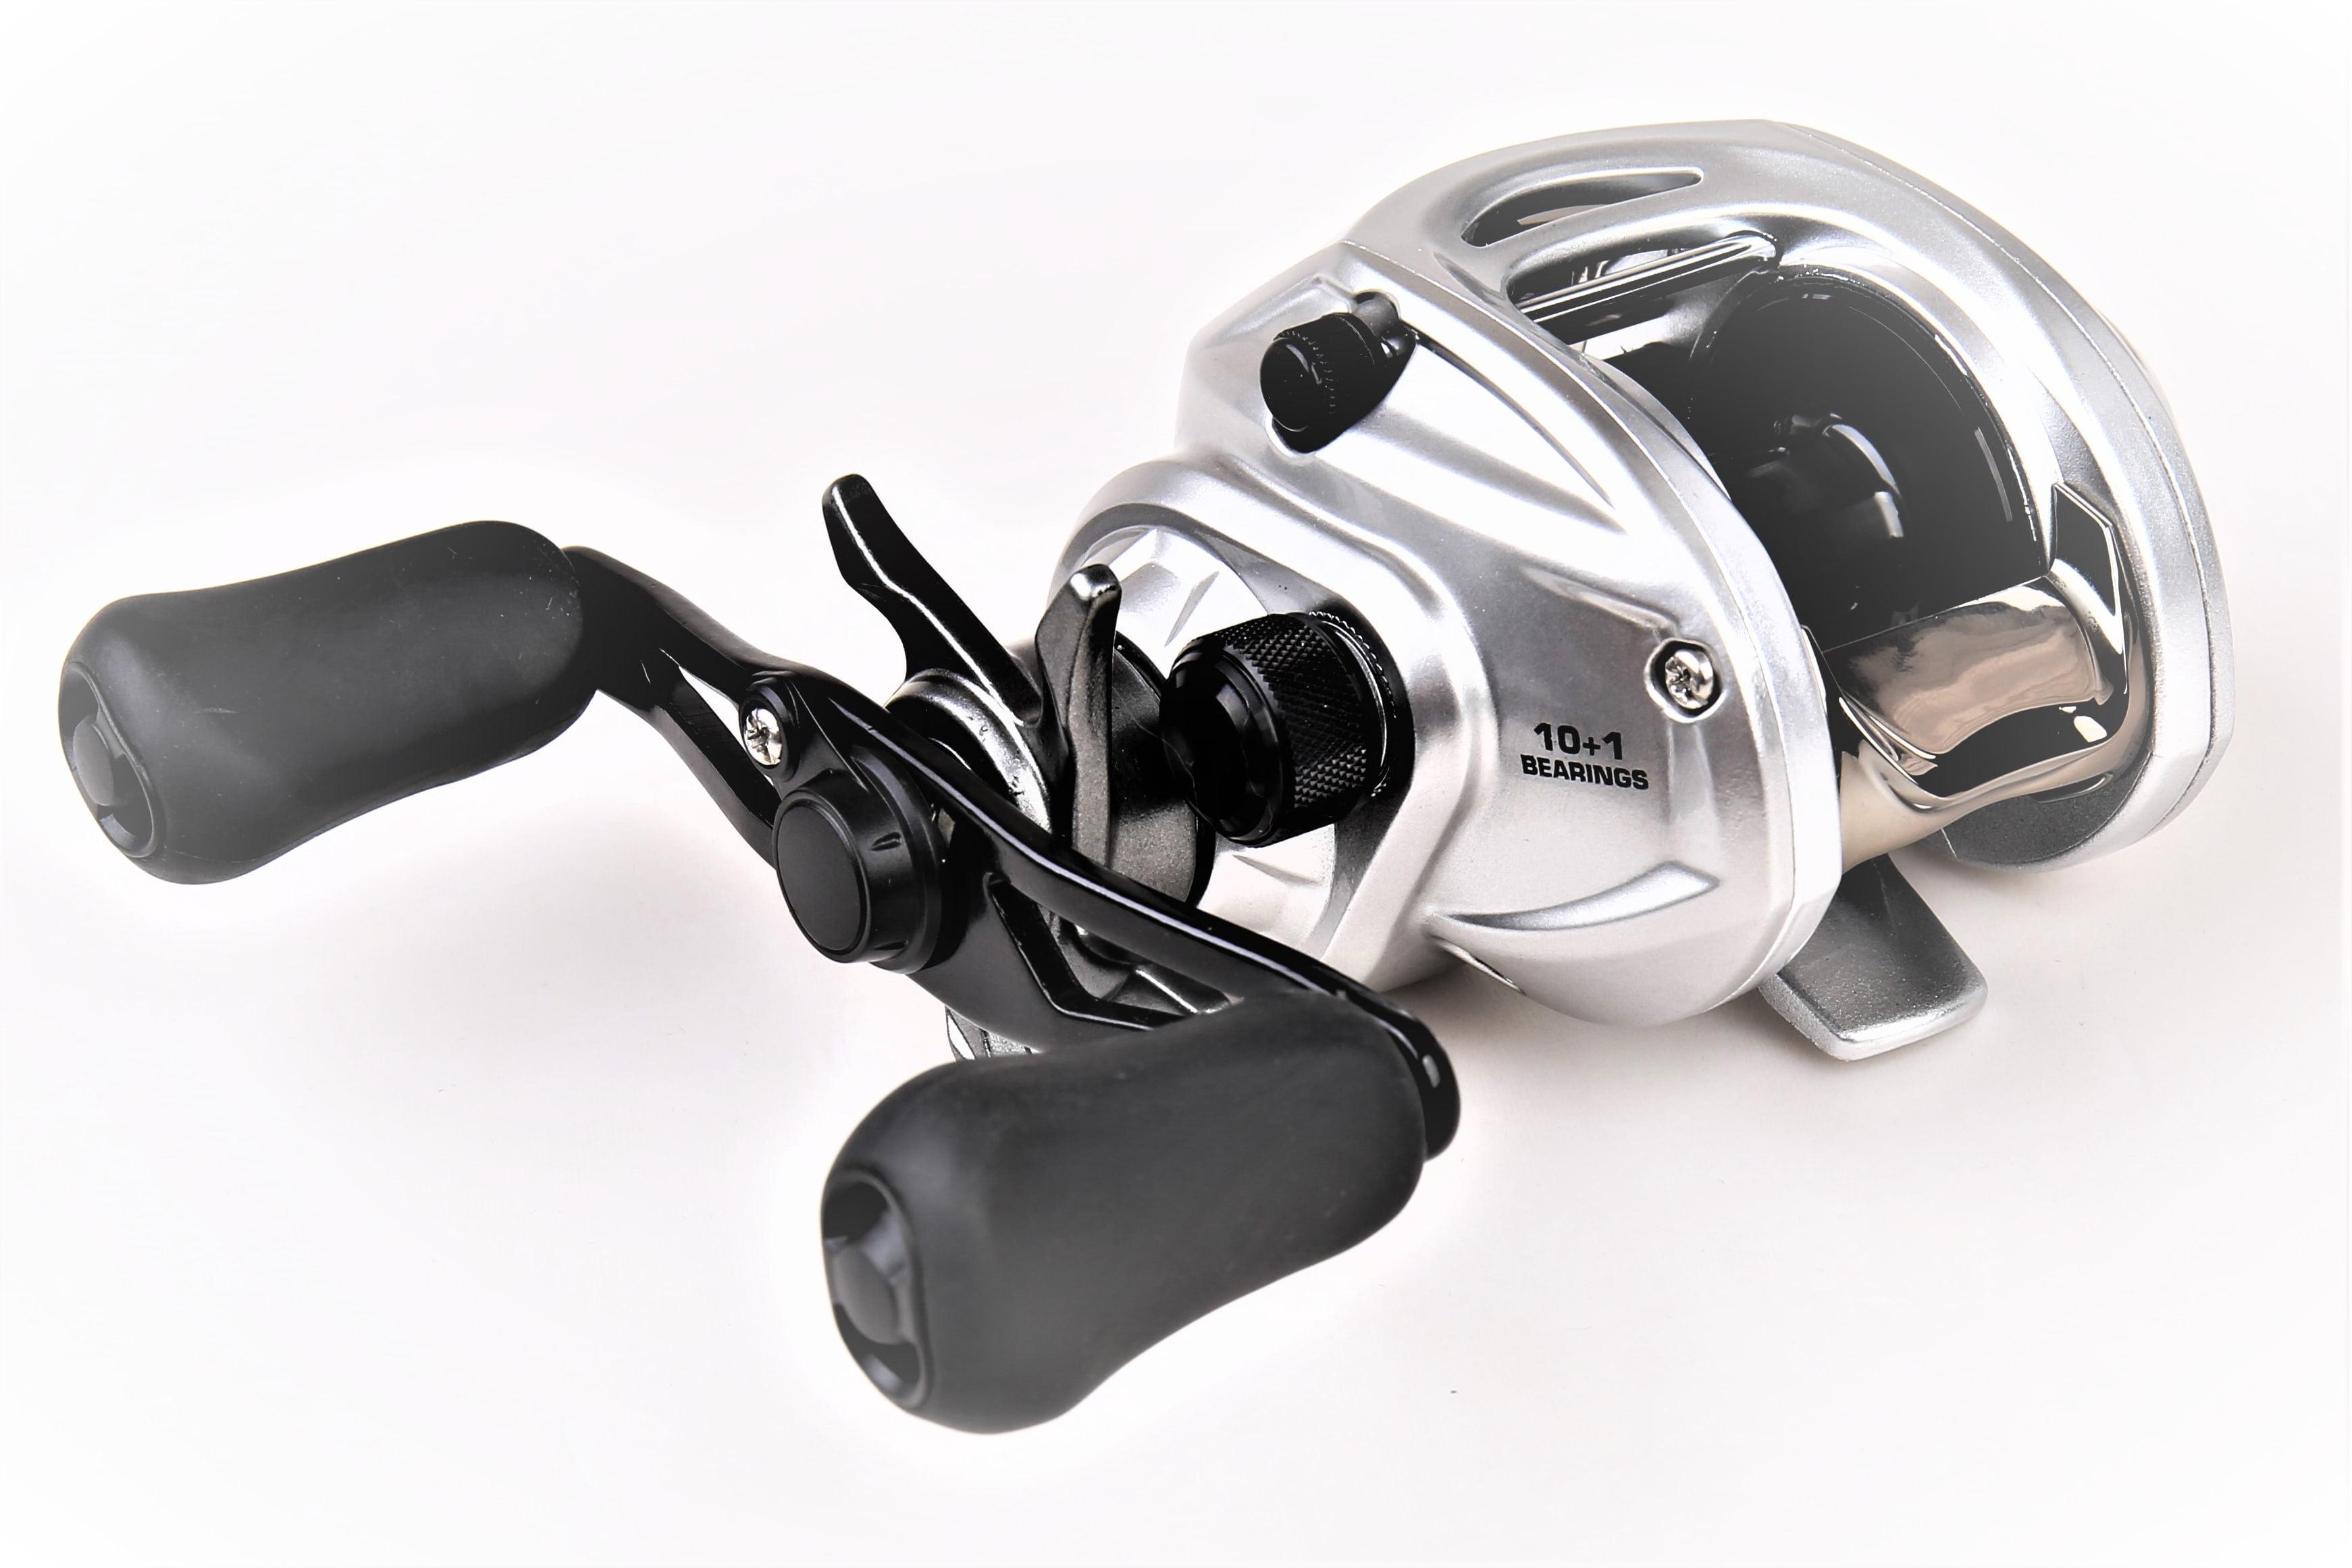 Carretilha Triton 11000-H